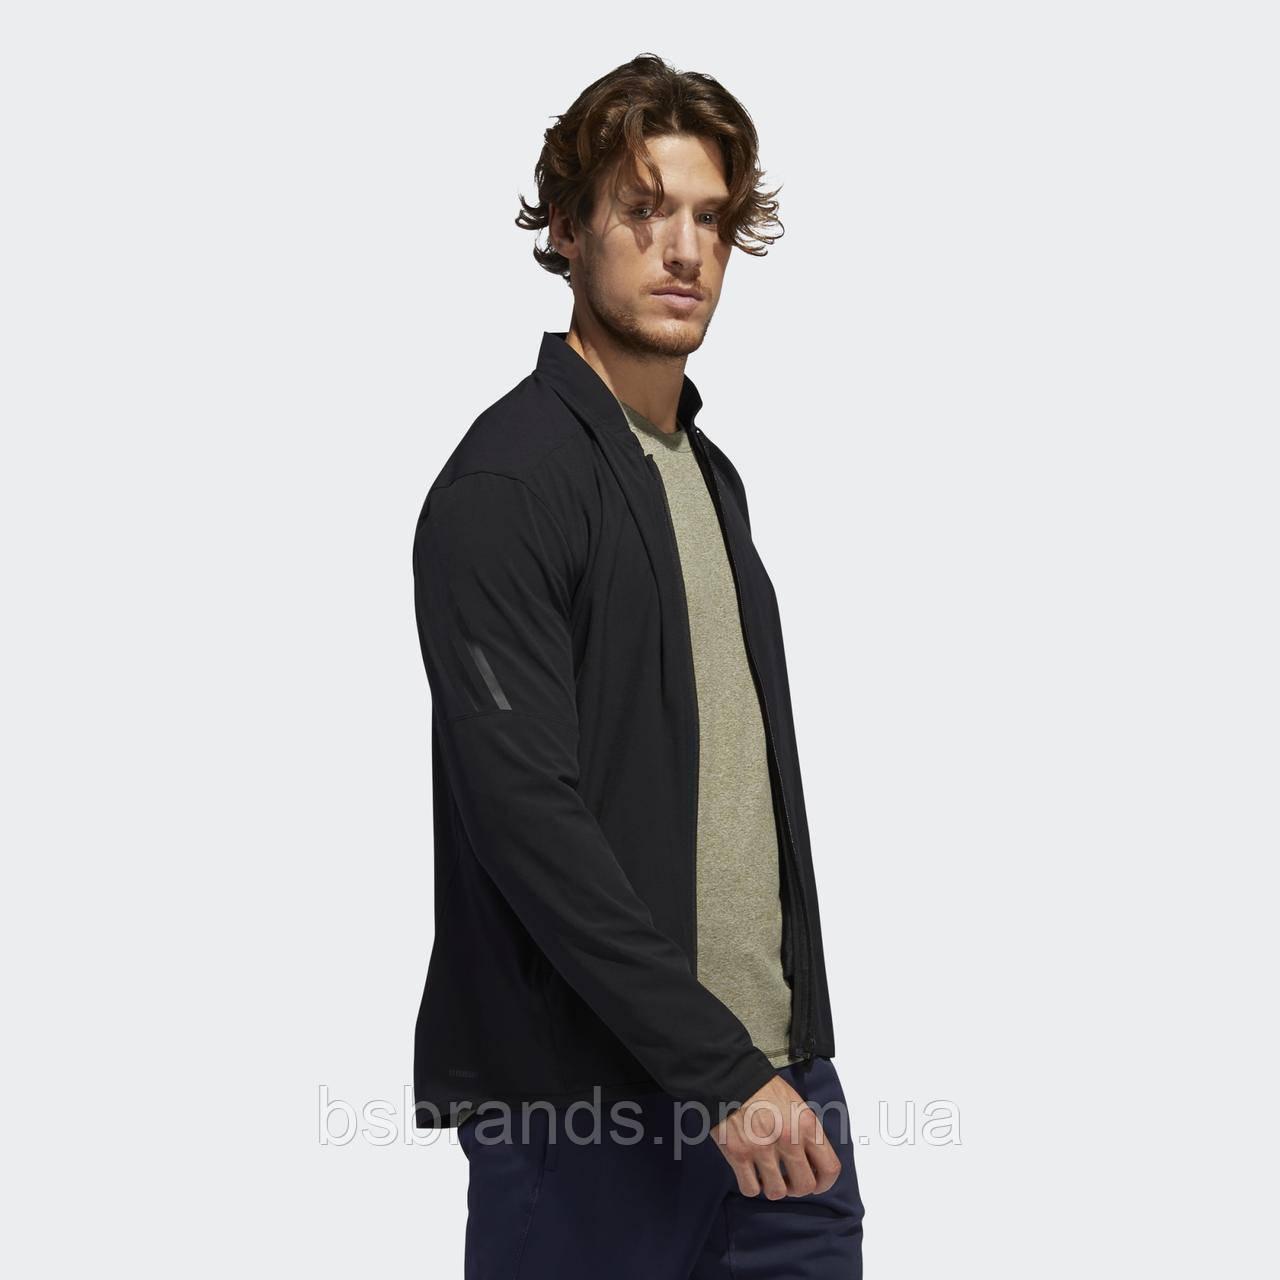 Мужская куртка adidas для фитнеса 3-Stripes FJ6138 (2020/1)